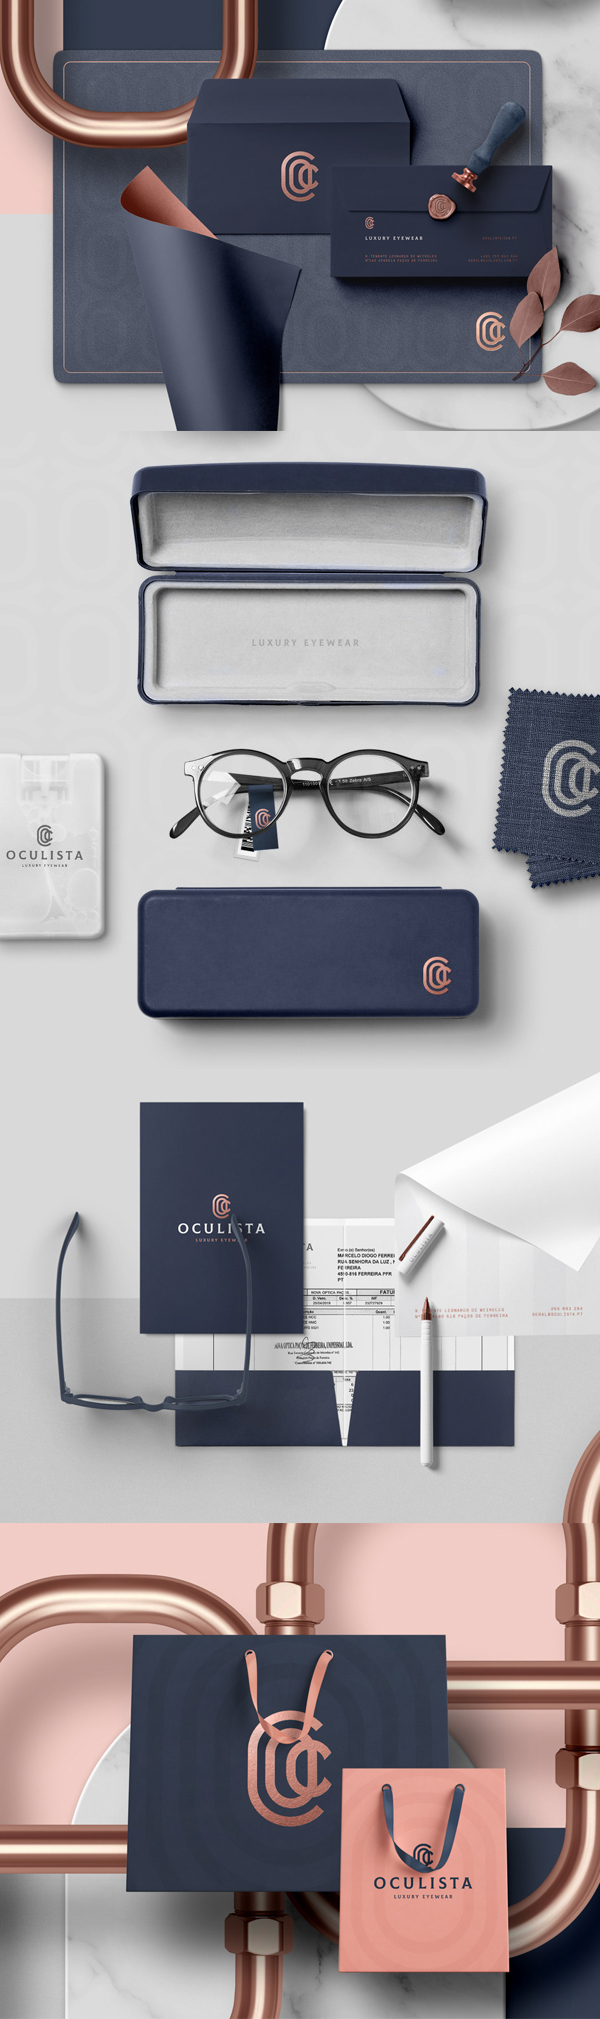 Stationery - Oculista - Branding by erva design